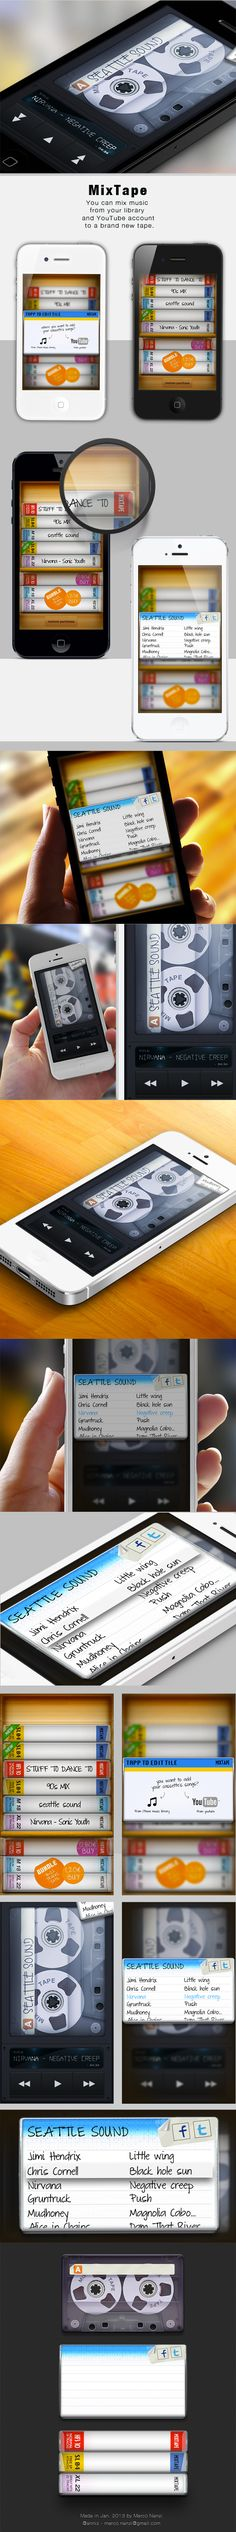 MixTape - iOS Music App - on Behance #ui #music #cassette